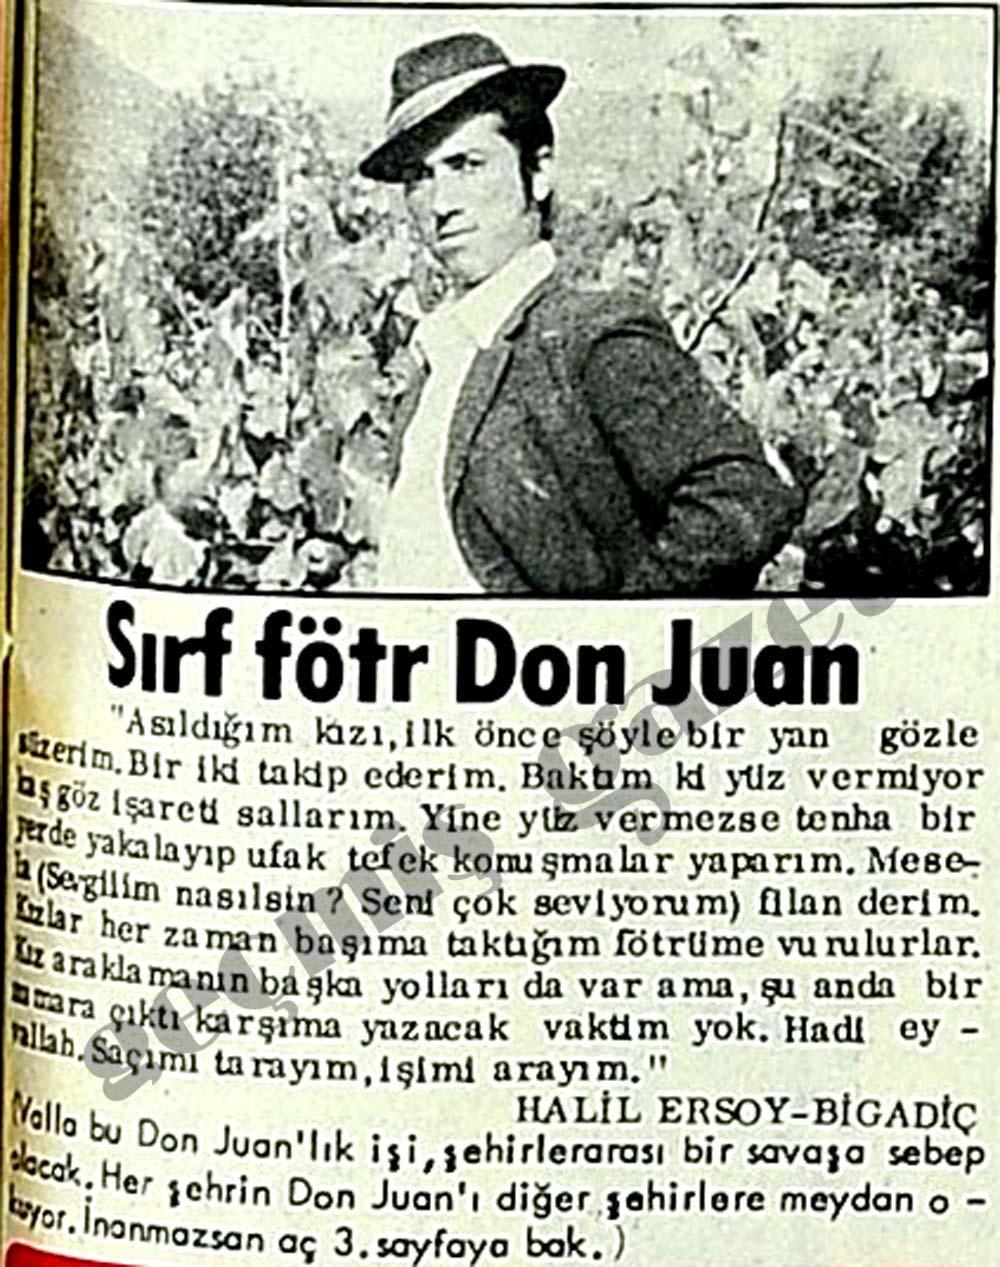 Sırf fötr Don Juan